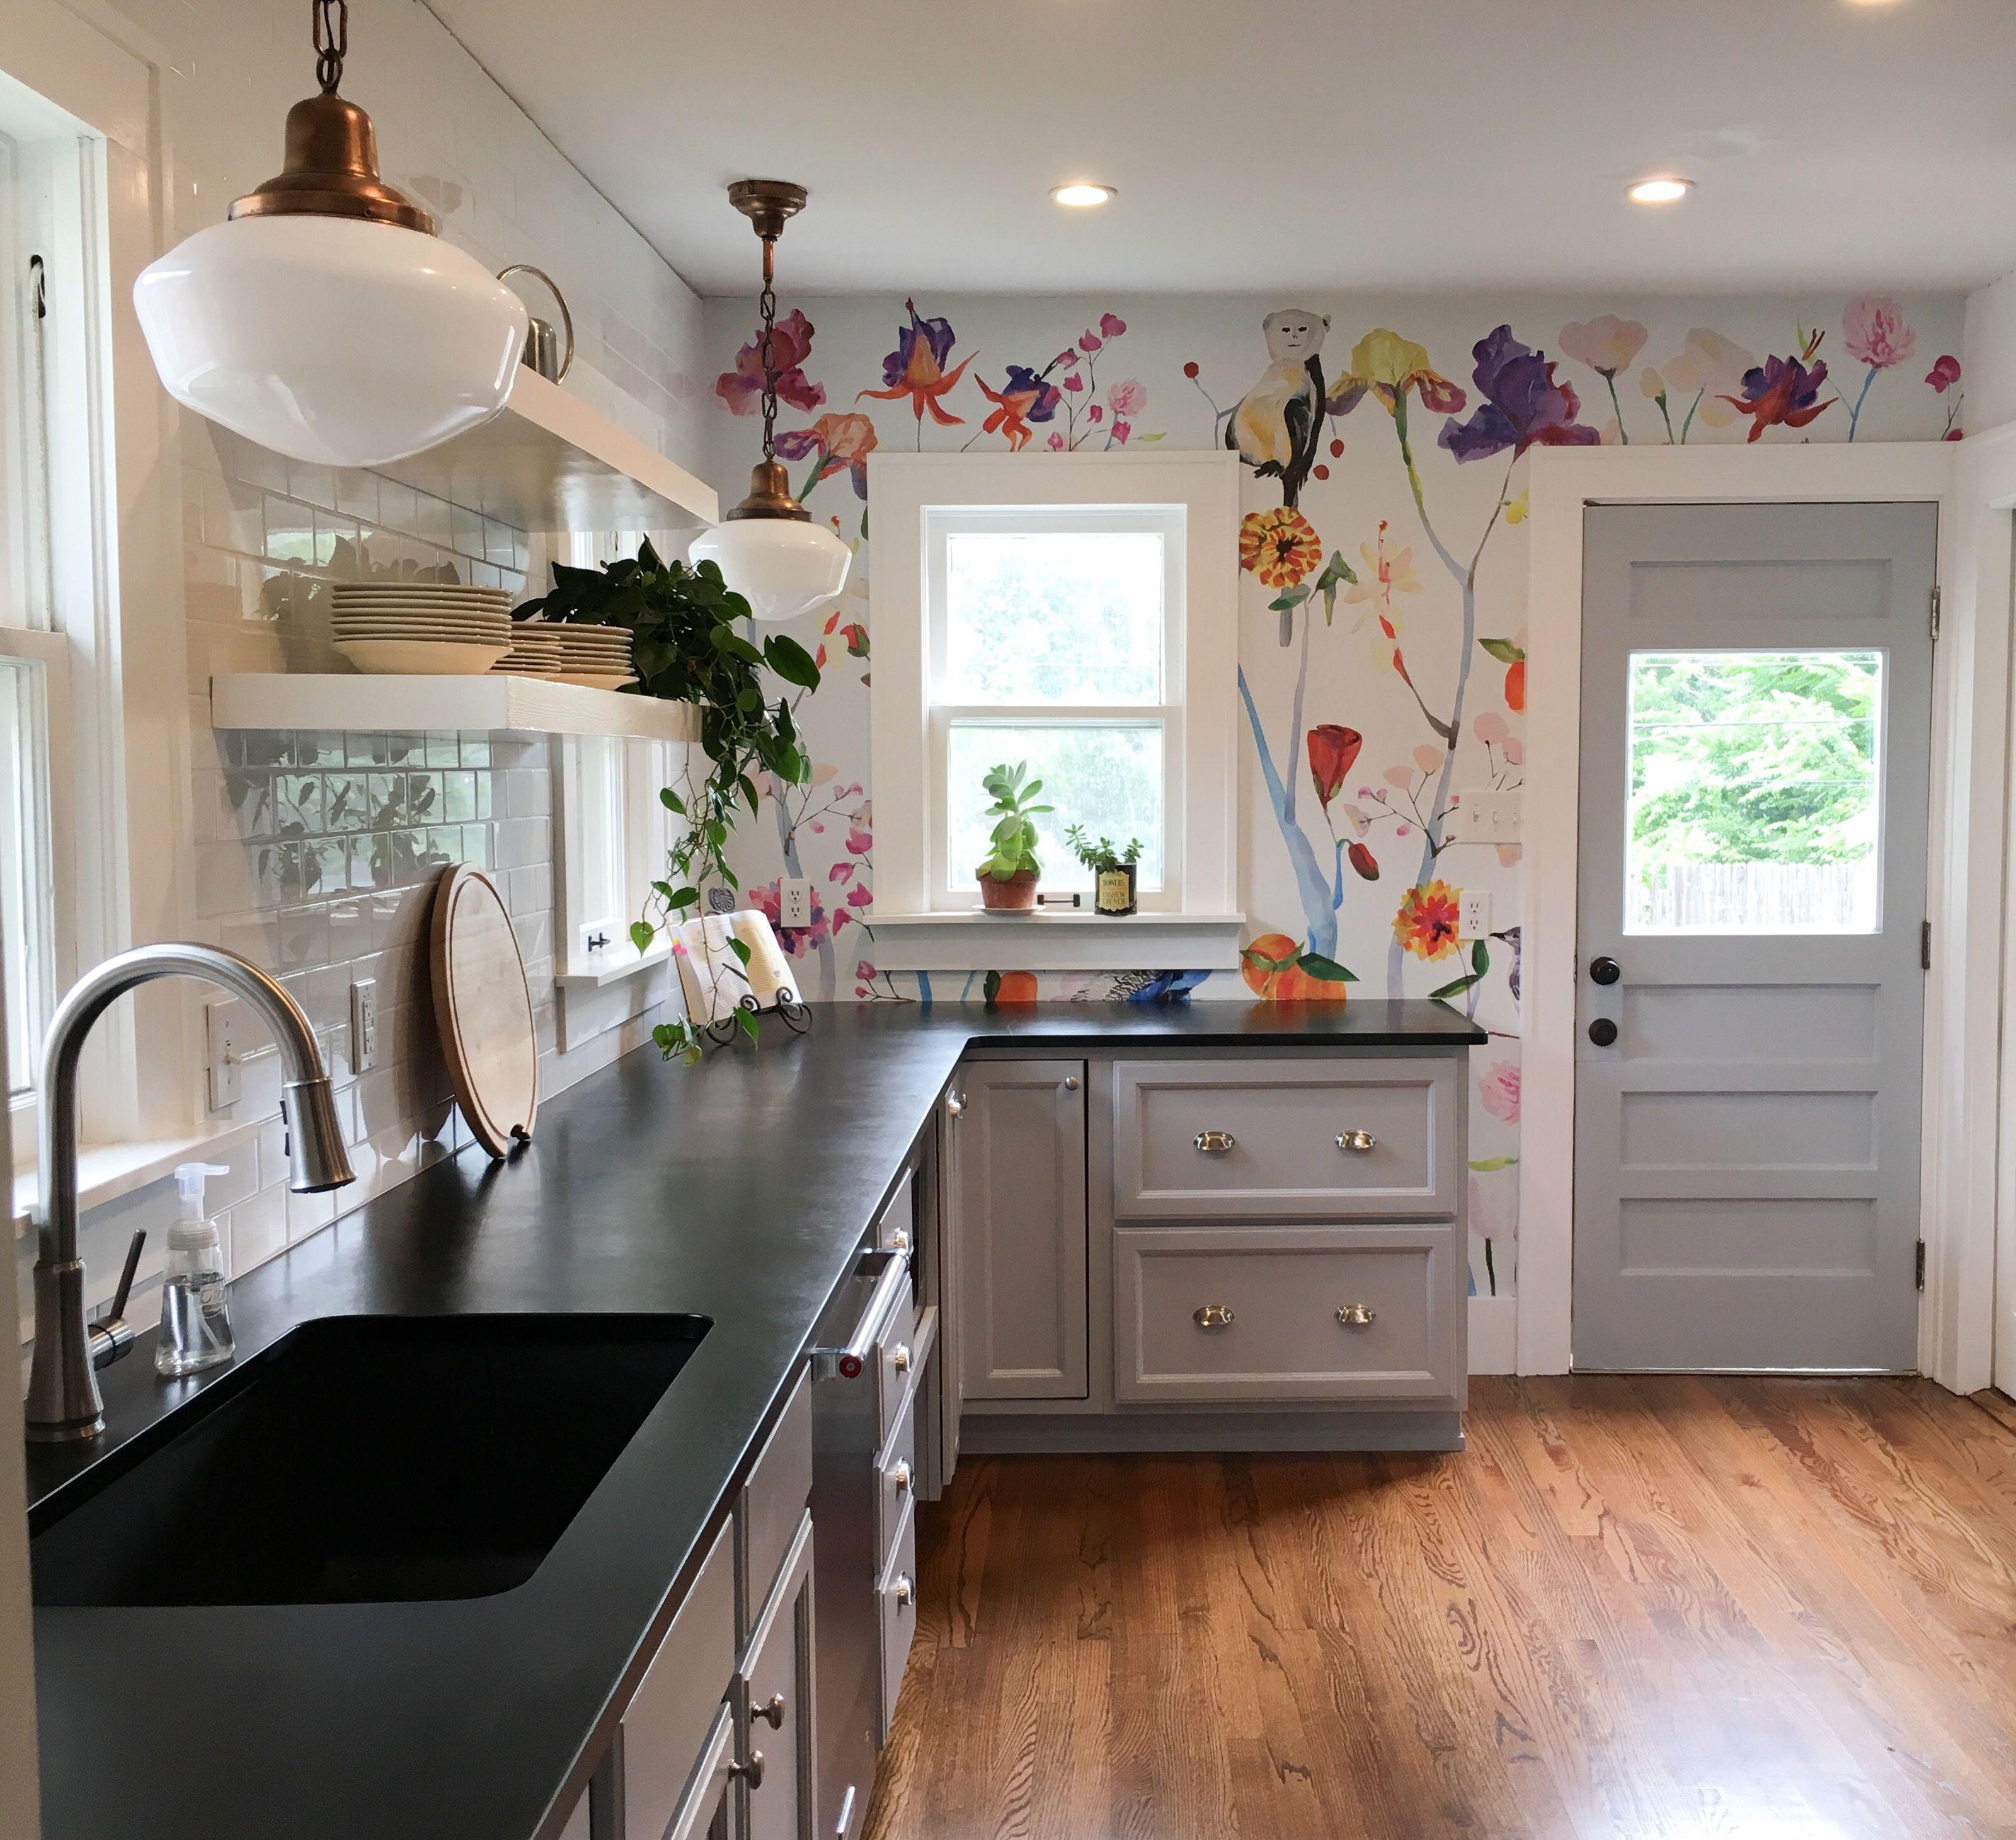 7 Smart Strategies For Kitchen Remodeling Kitchen Remodeling Projects Kitchen Remodel Small Kitchen Renovation